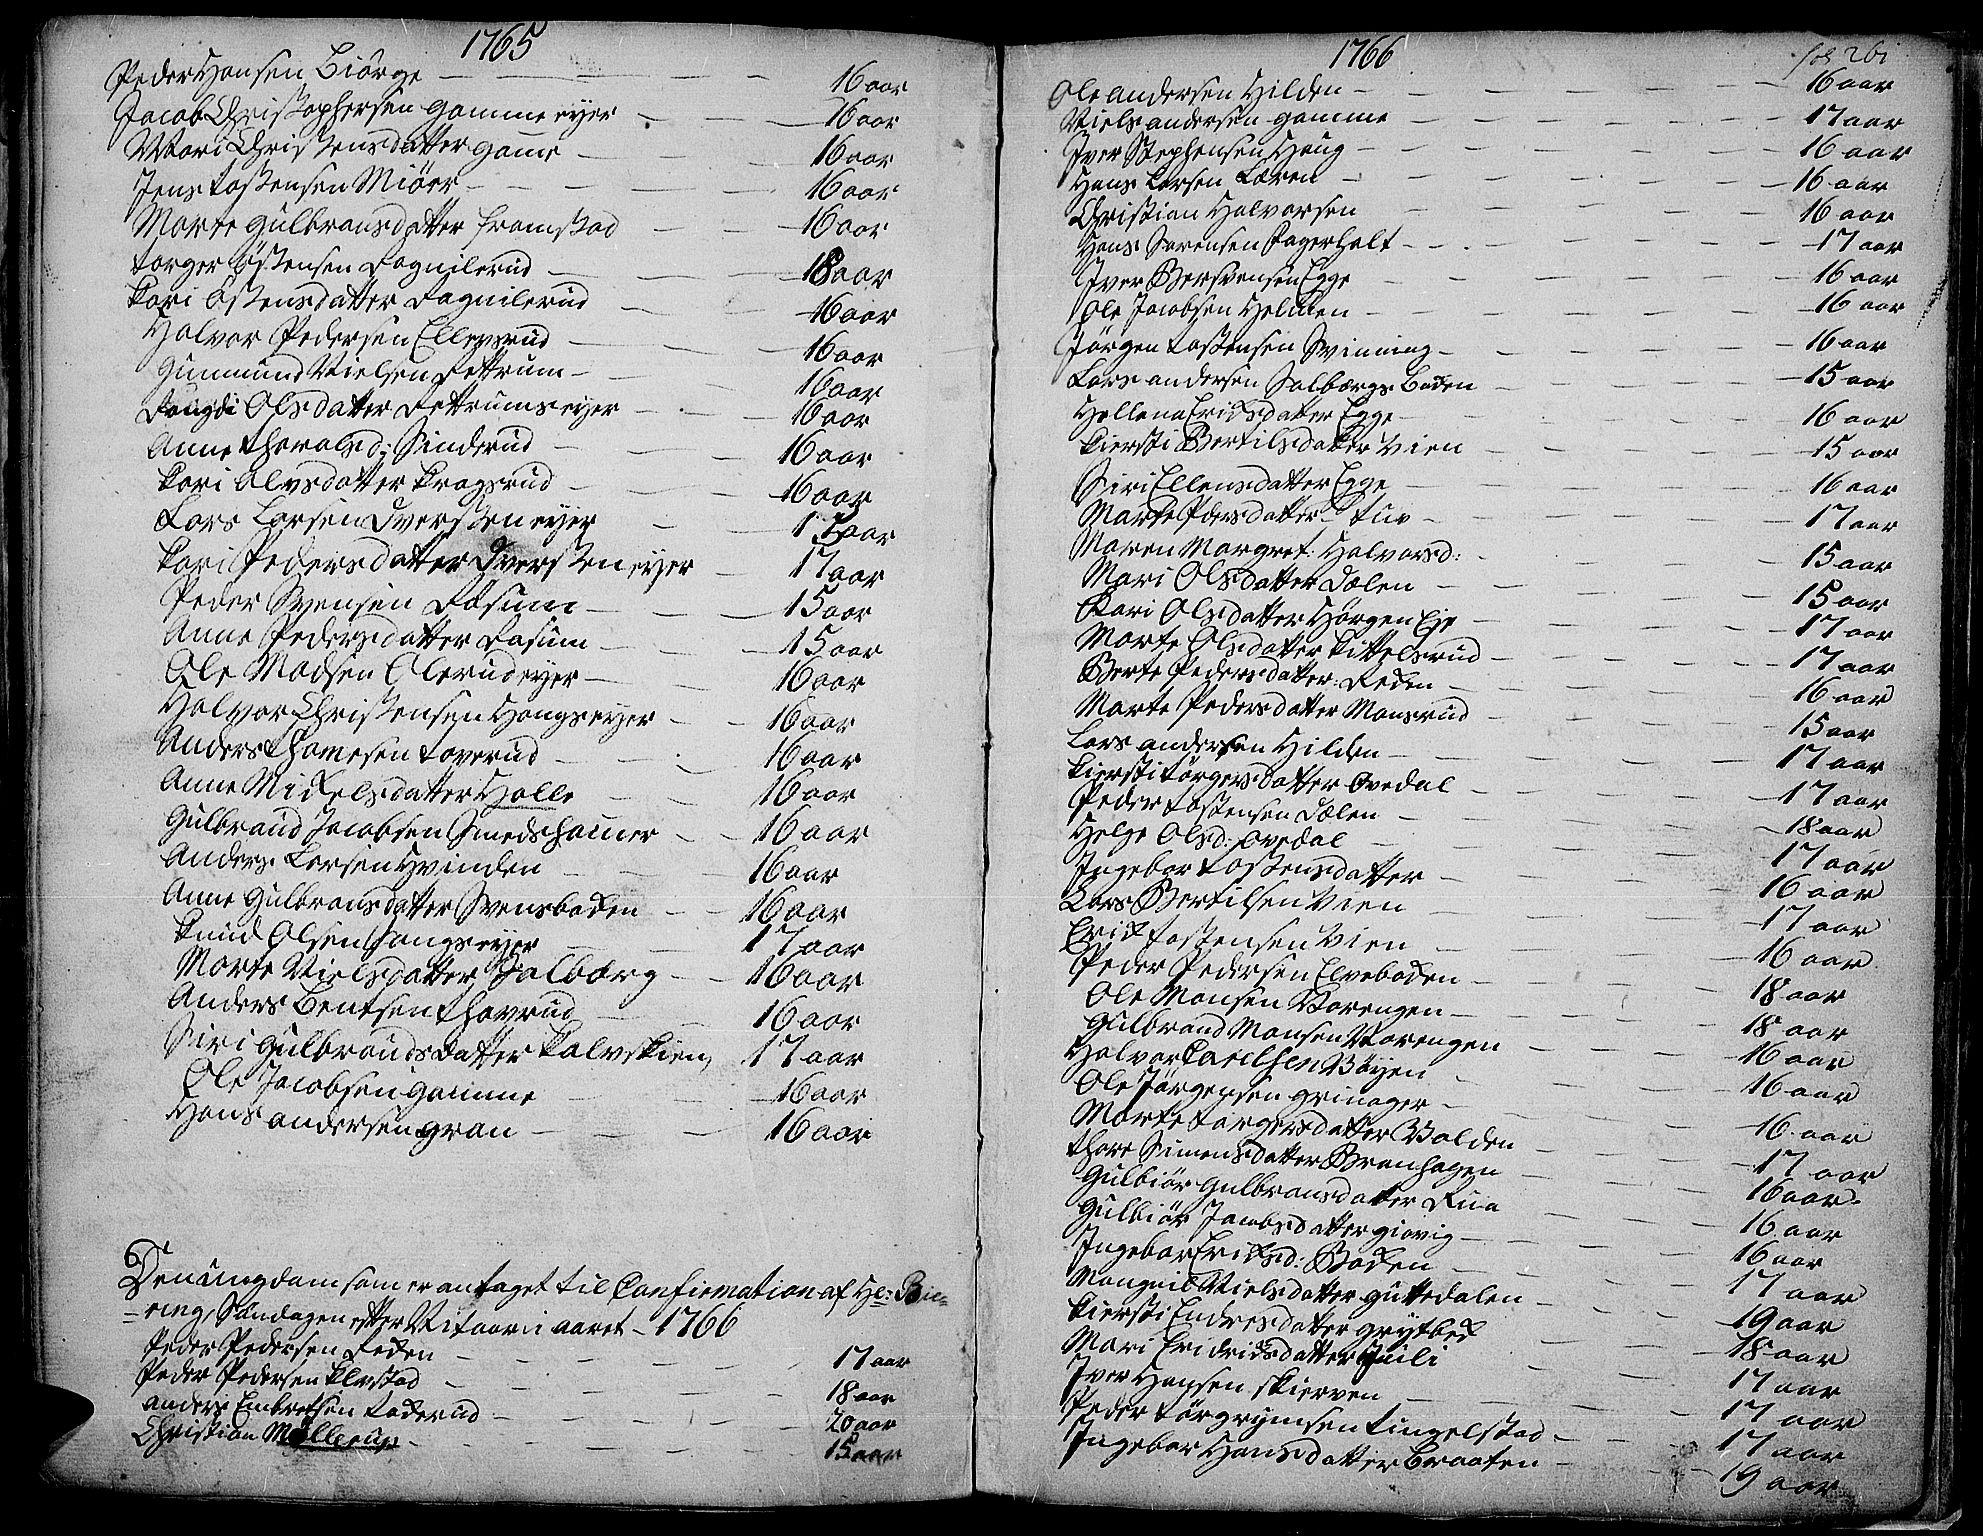 SAH, Gran prestekontor, Ministerialbok nr. 4, 1759-1775, s. 261